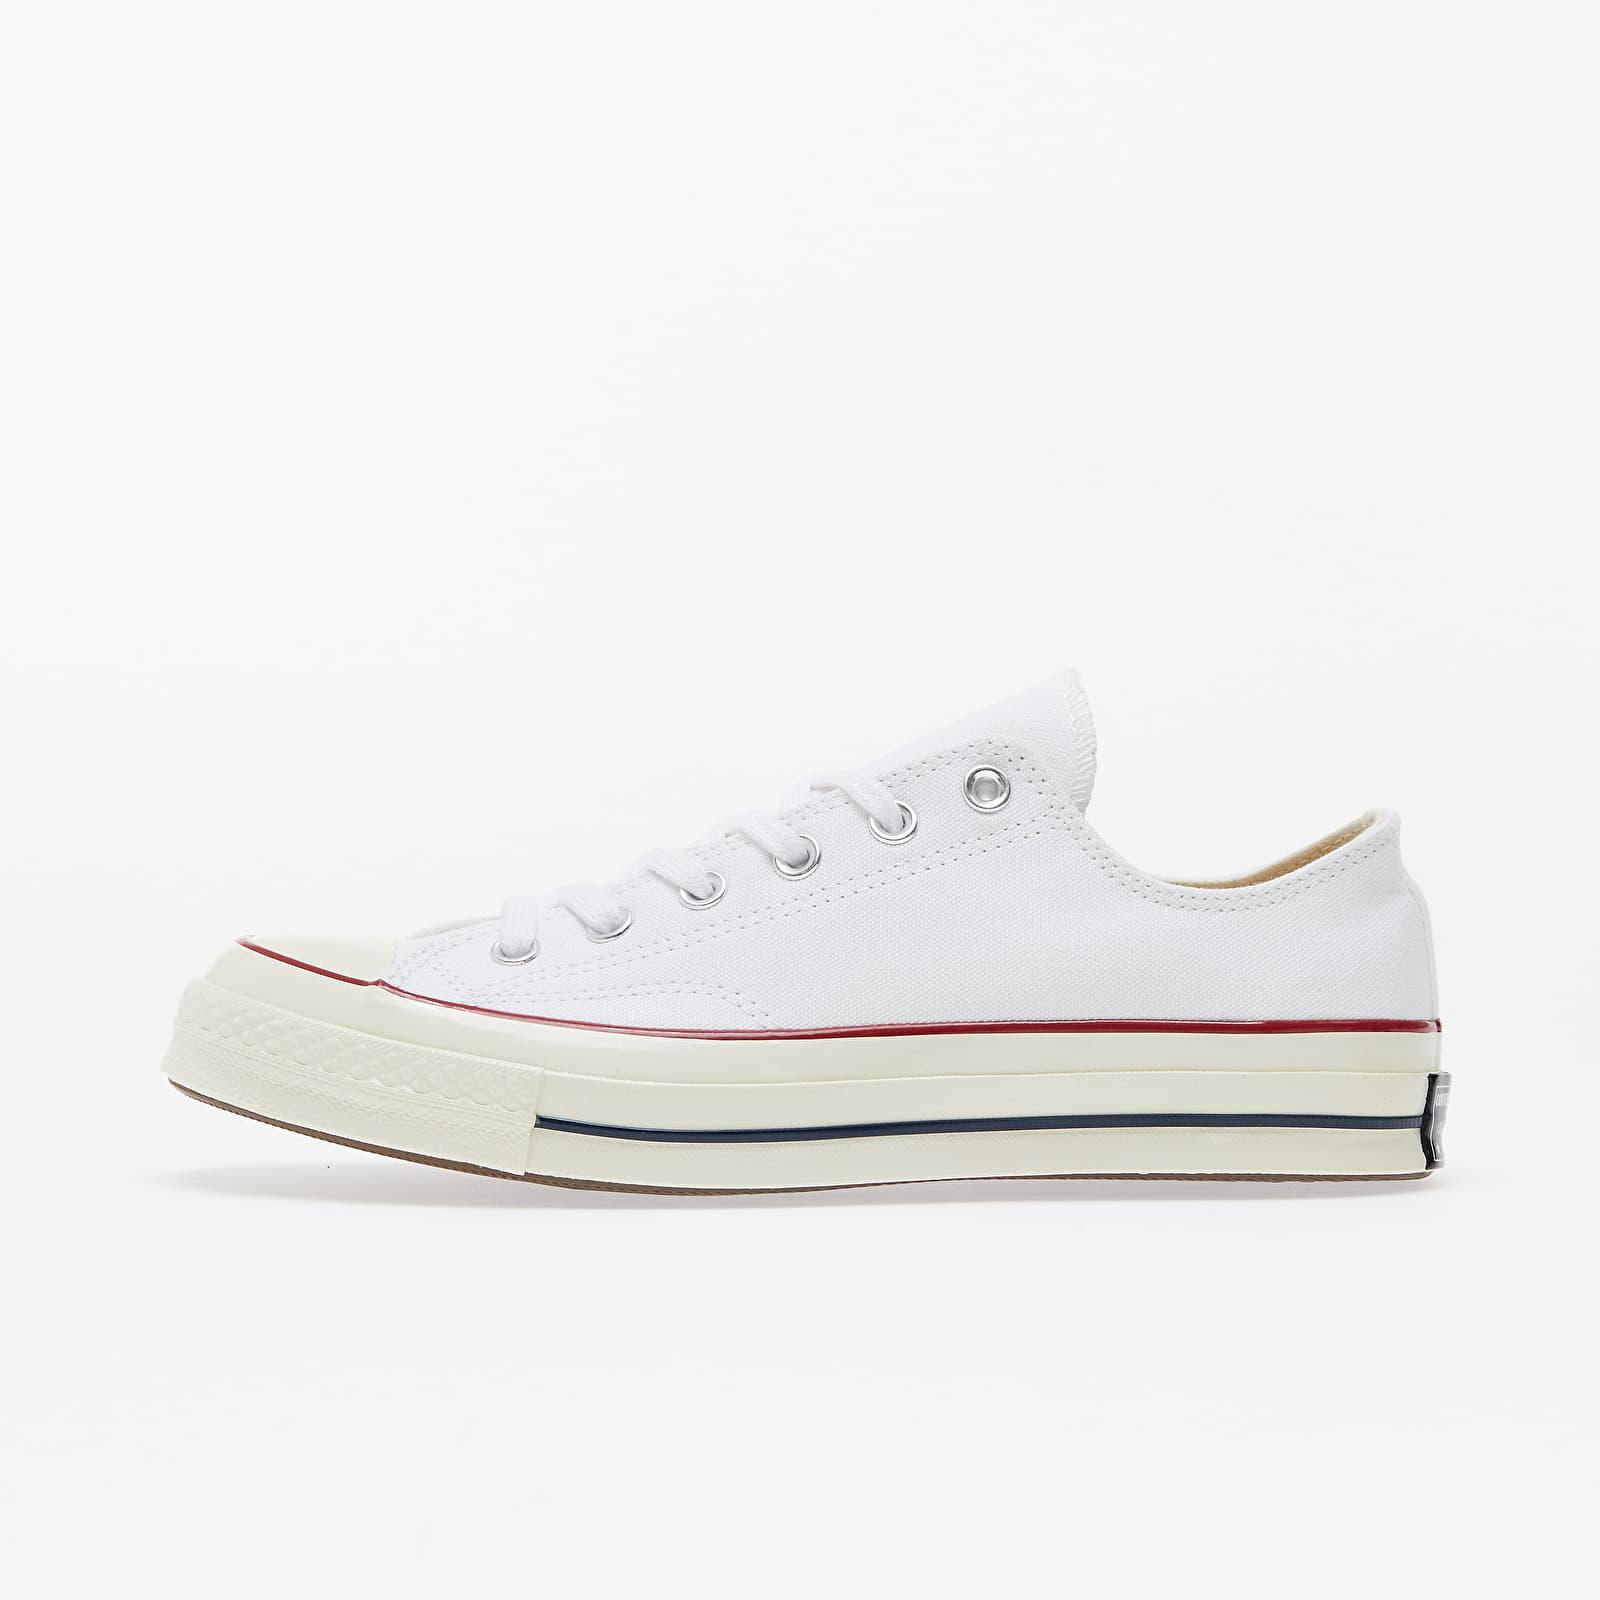 Men's shoes Converse Chuck Taylor All Star 70 Ox White/ Garnet/ Egret